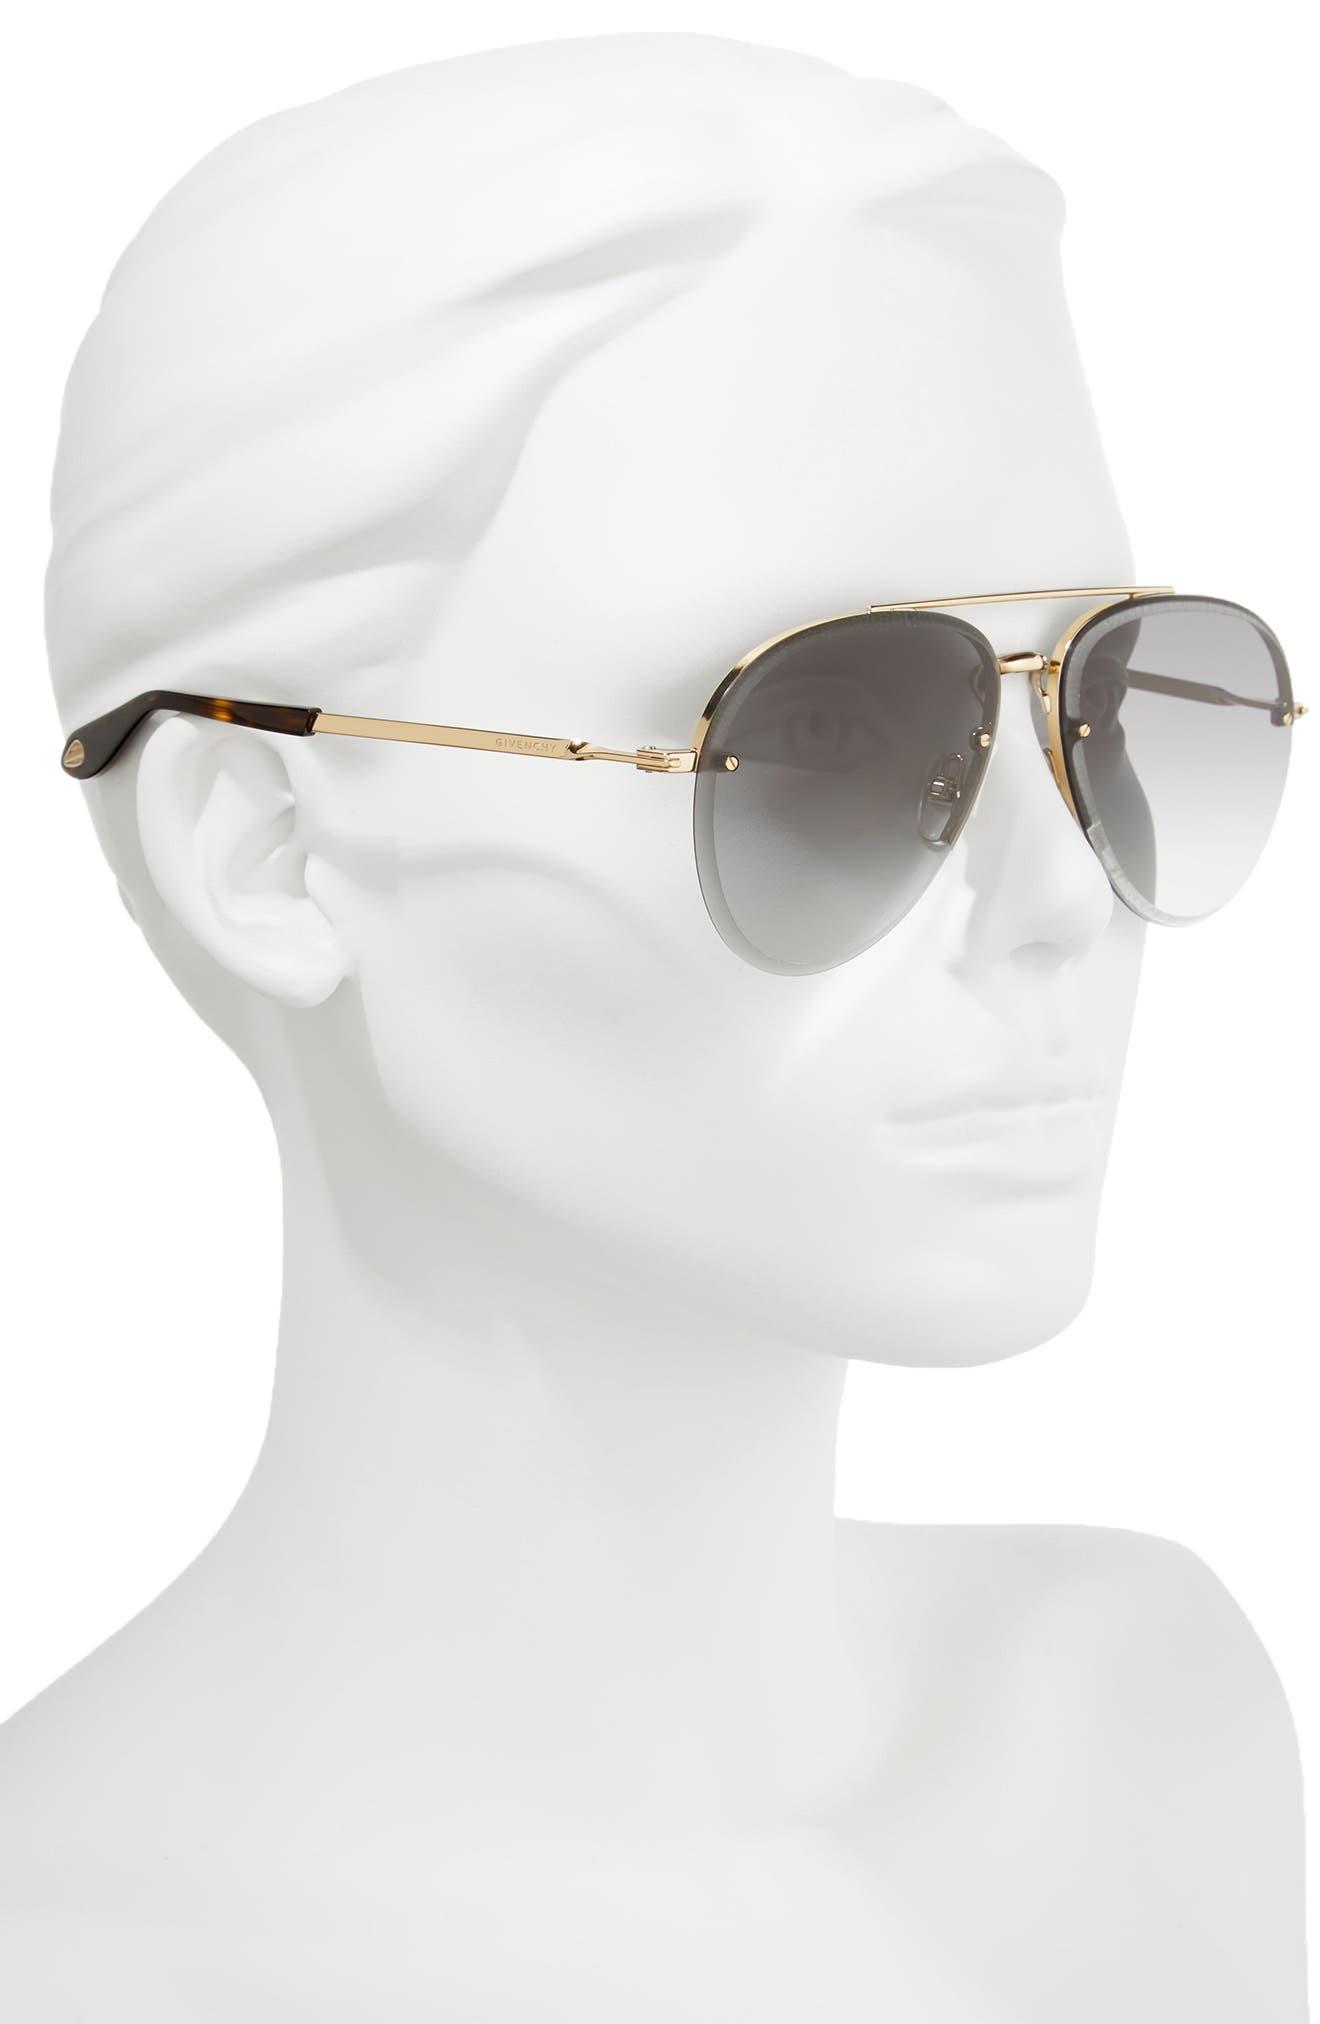 62mm Oversize Aviator Sunglasses,                             Alternate thumbnail 2, color,                             Gold